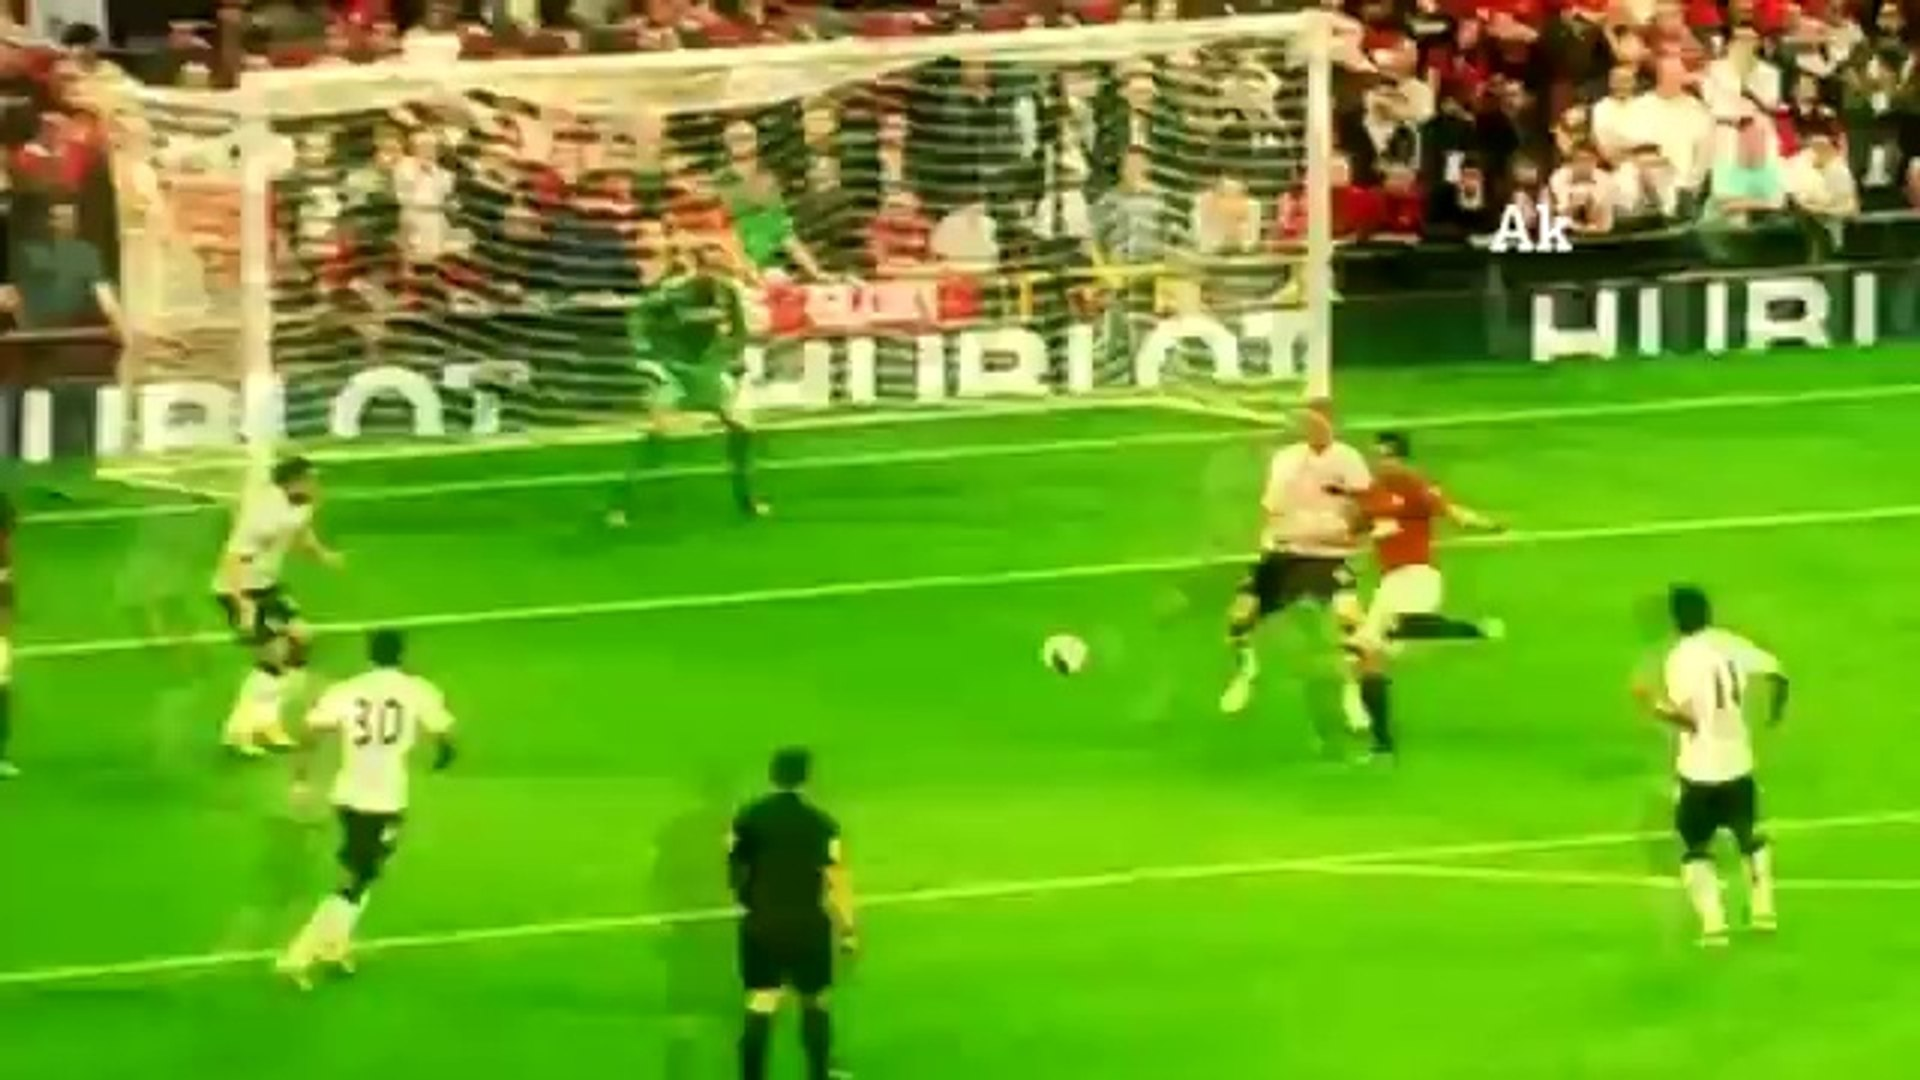 Derby: Manchester City vs Manchester United TRANSMISJA NA ŻYWO HD ONLINE